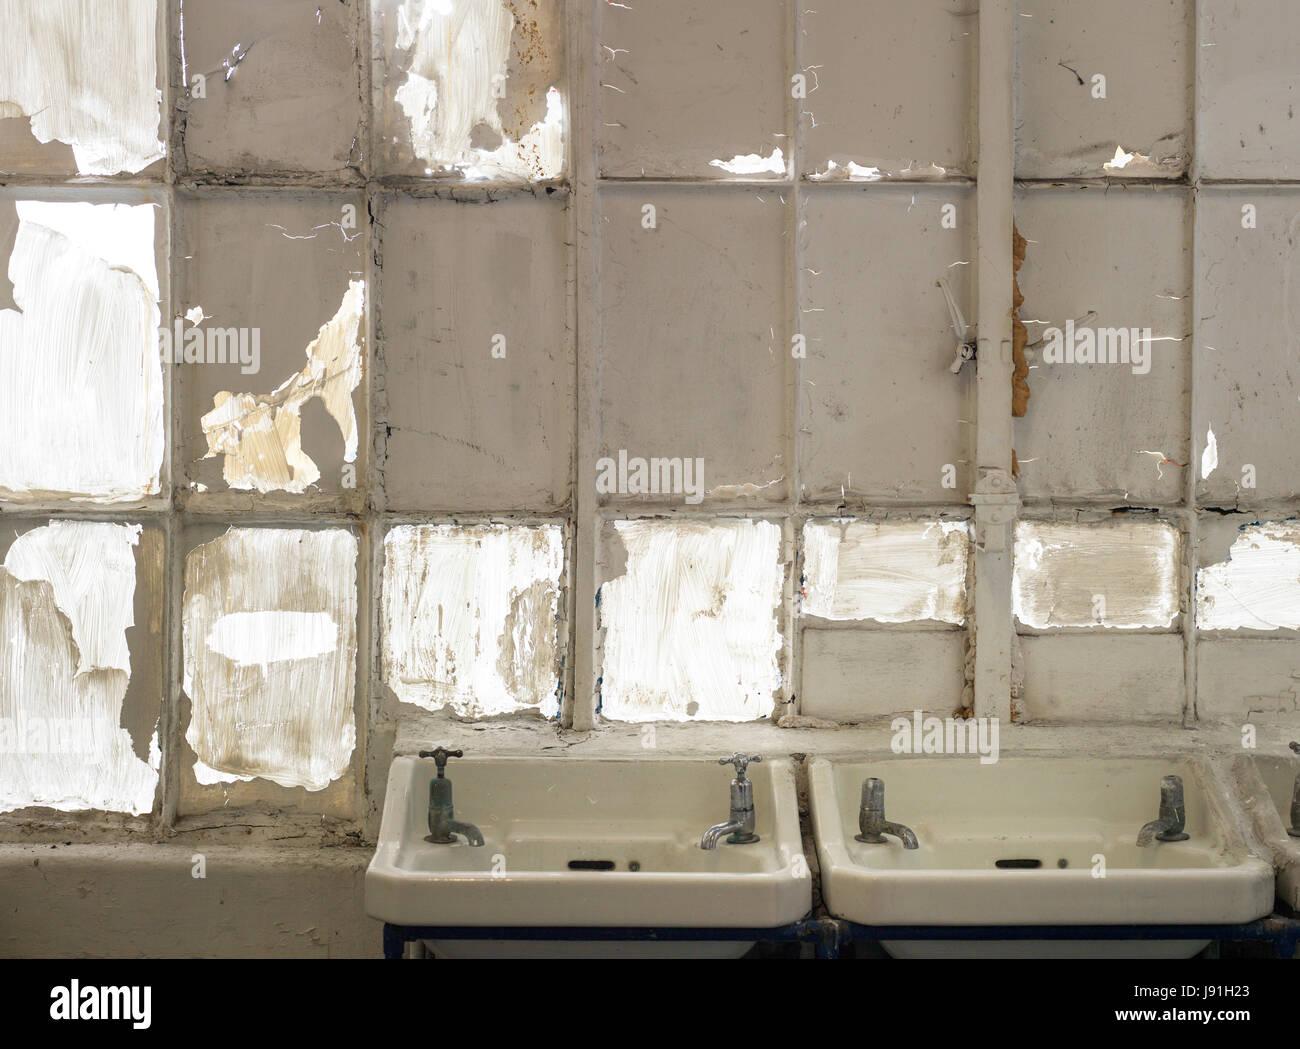 dirty white bathroom sinks in toilet block - Stock Image